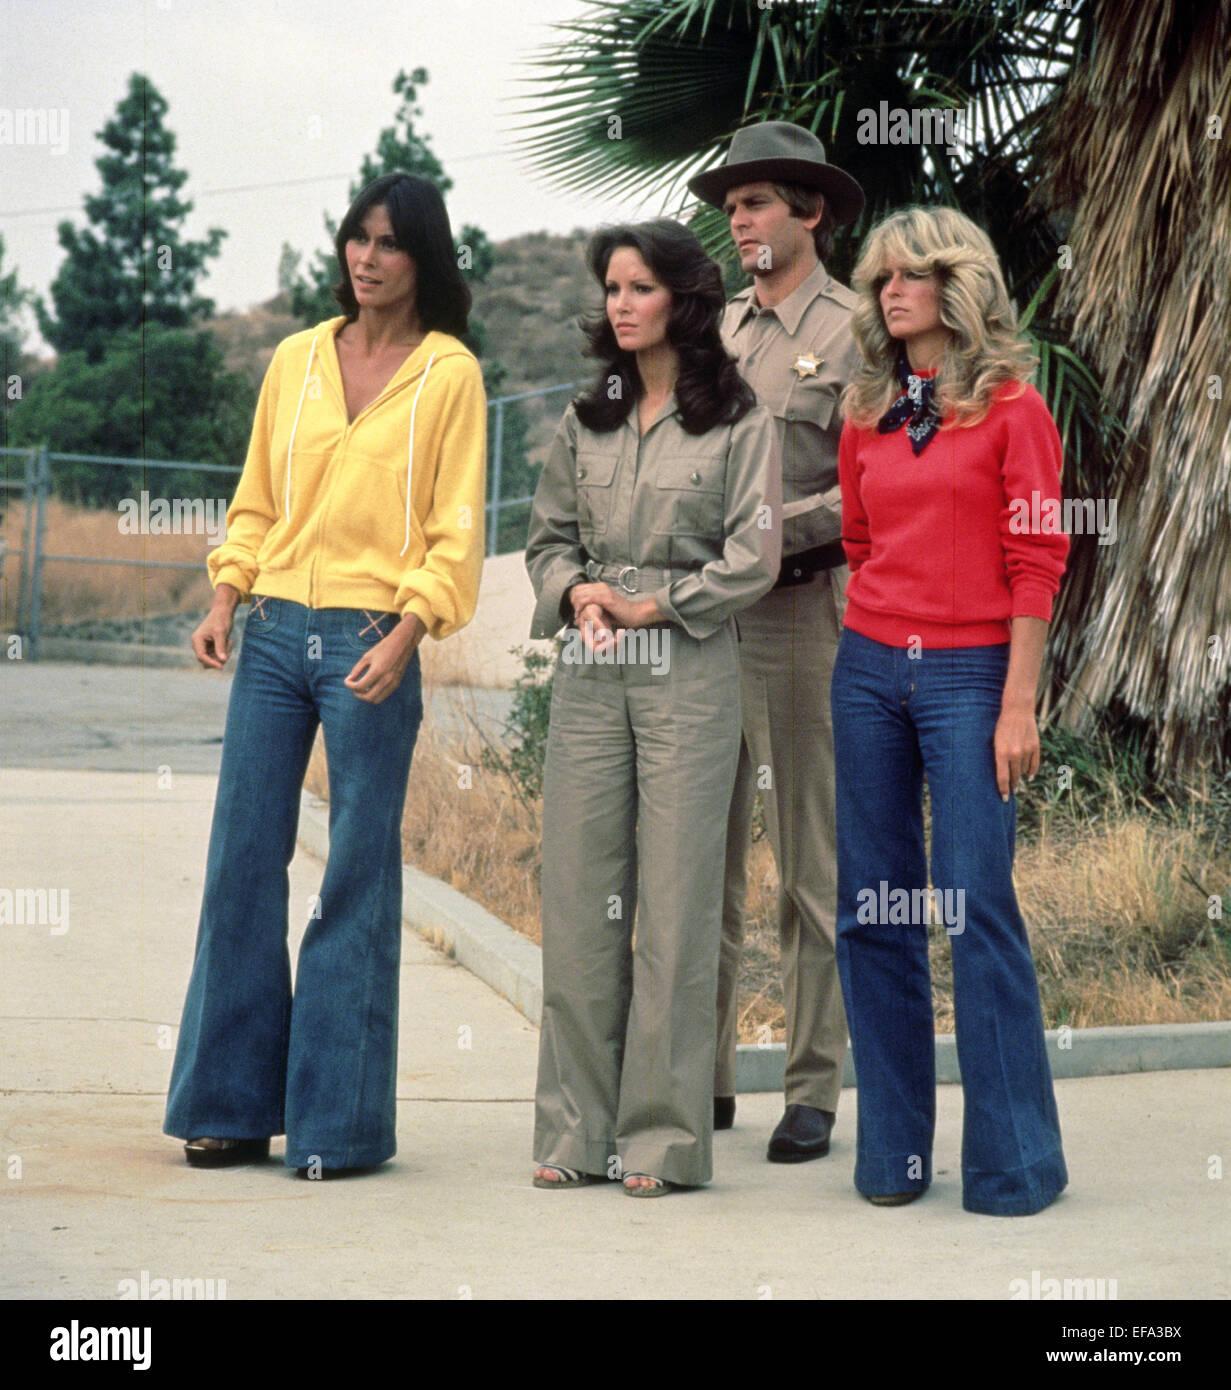 KATE JACKSON, JACLYN SMITH, FARRAH FAWCETT, CHARLIE'S ANGELS, 1976 - Stock Image